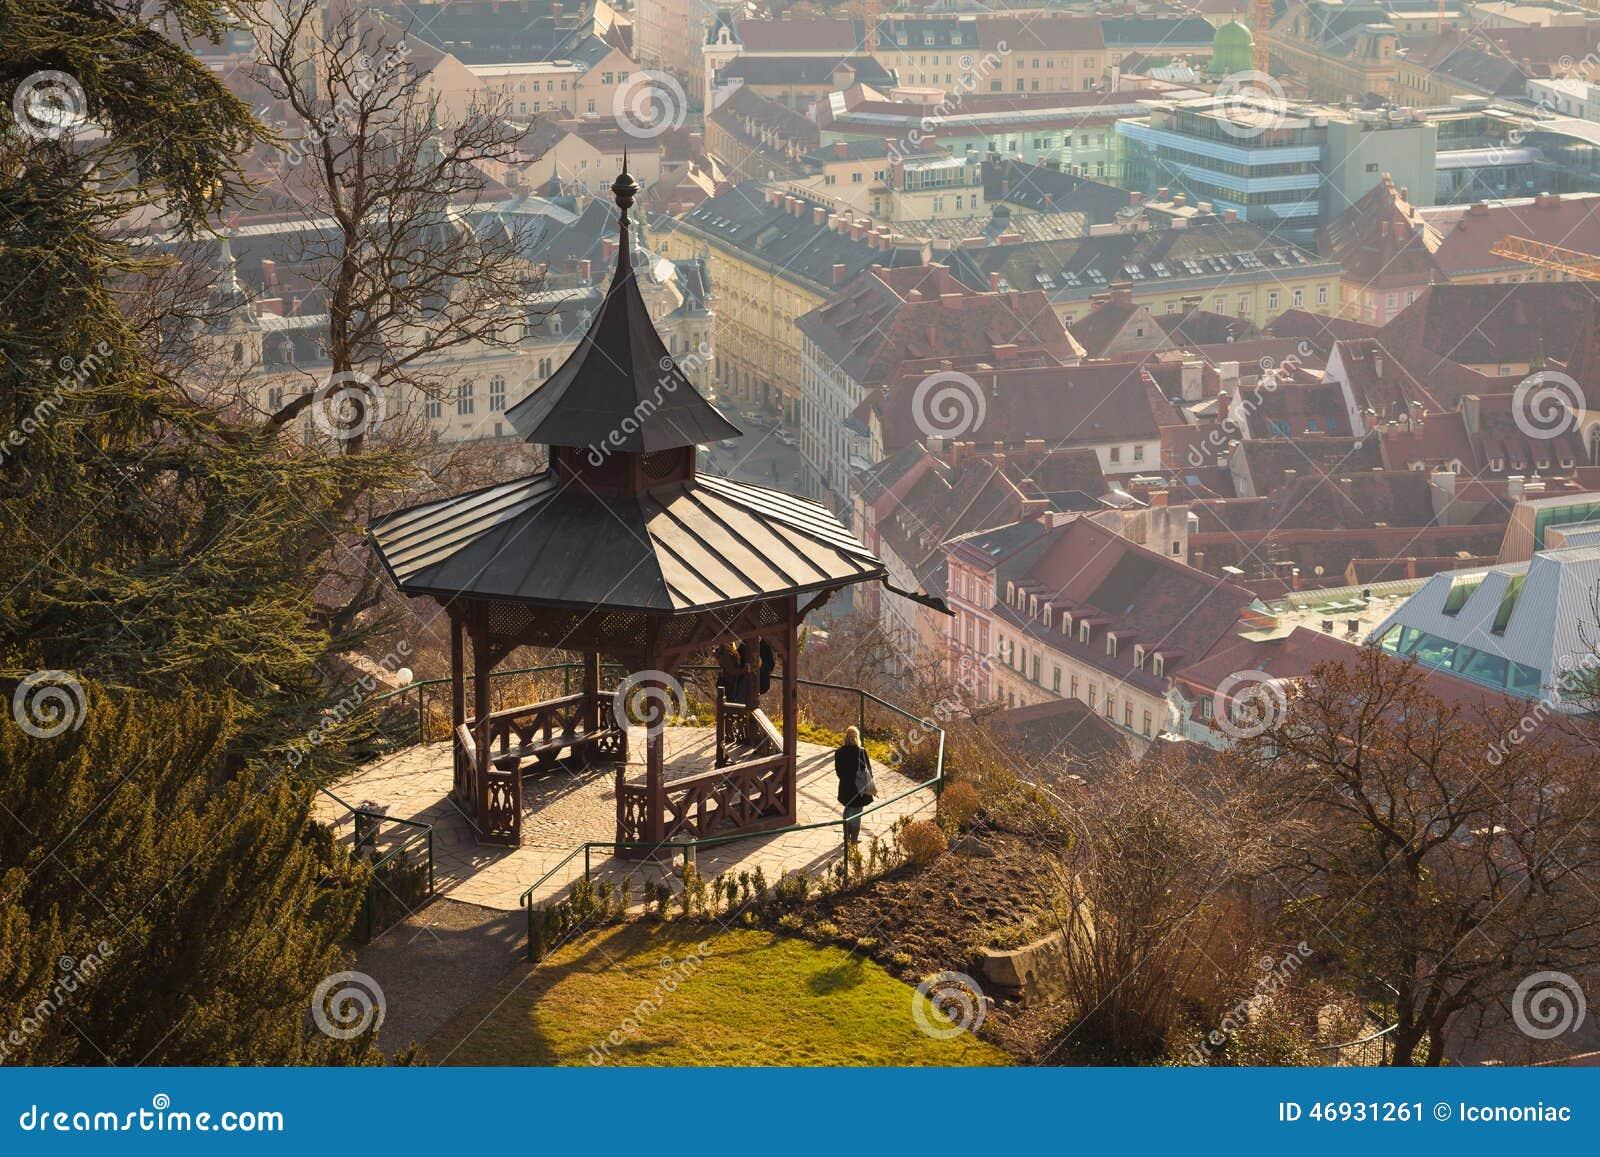 View Of Gazebo On Schlossberg Hill On Top Of Graz City